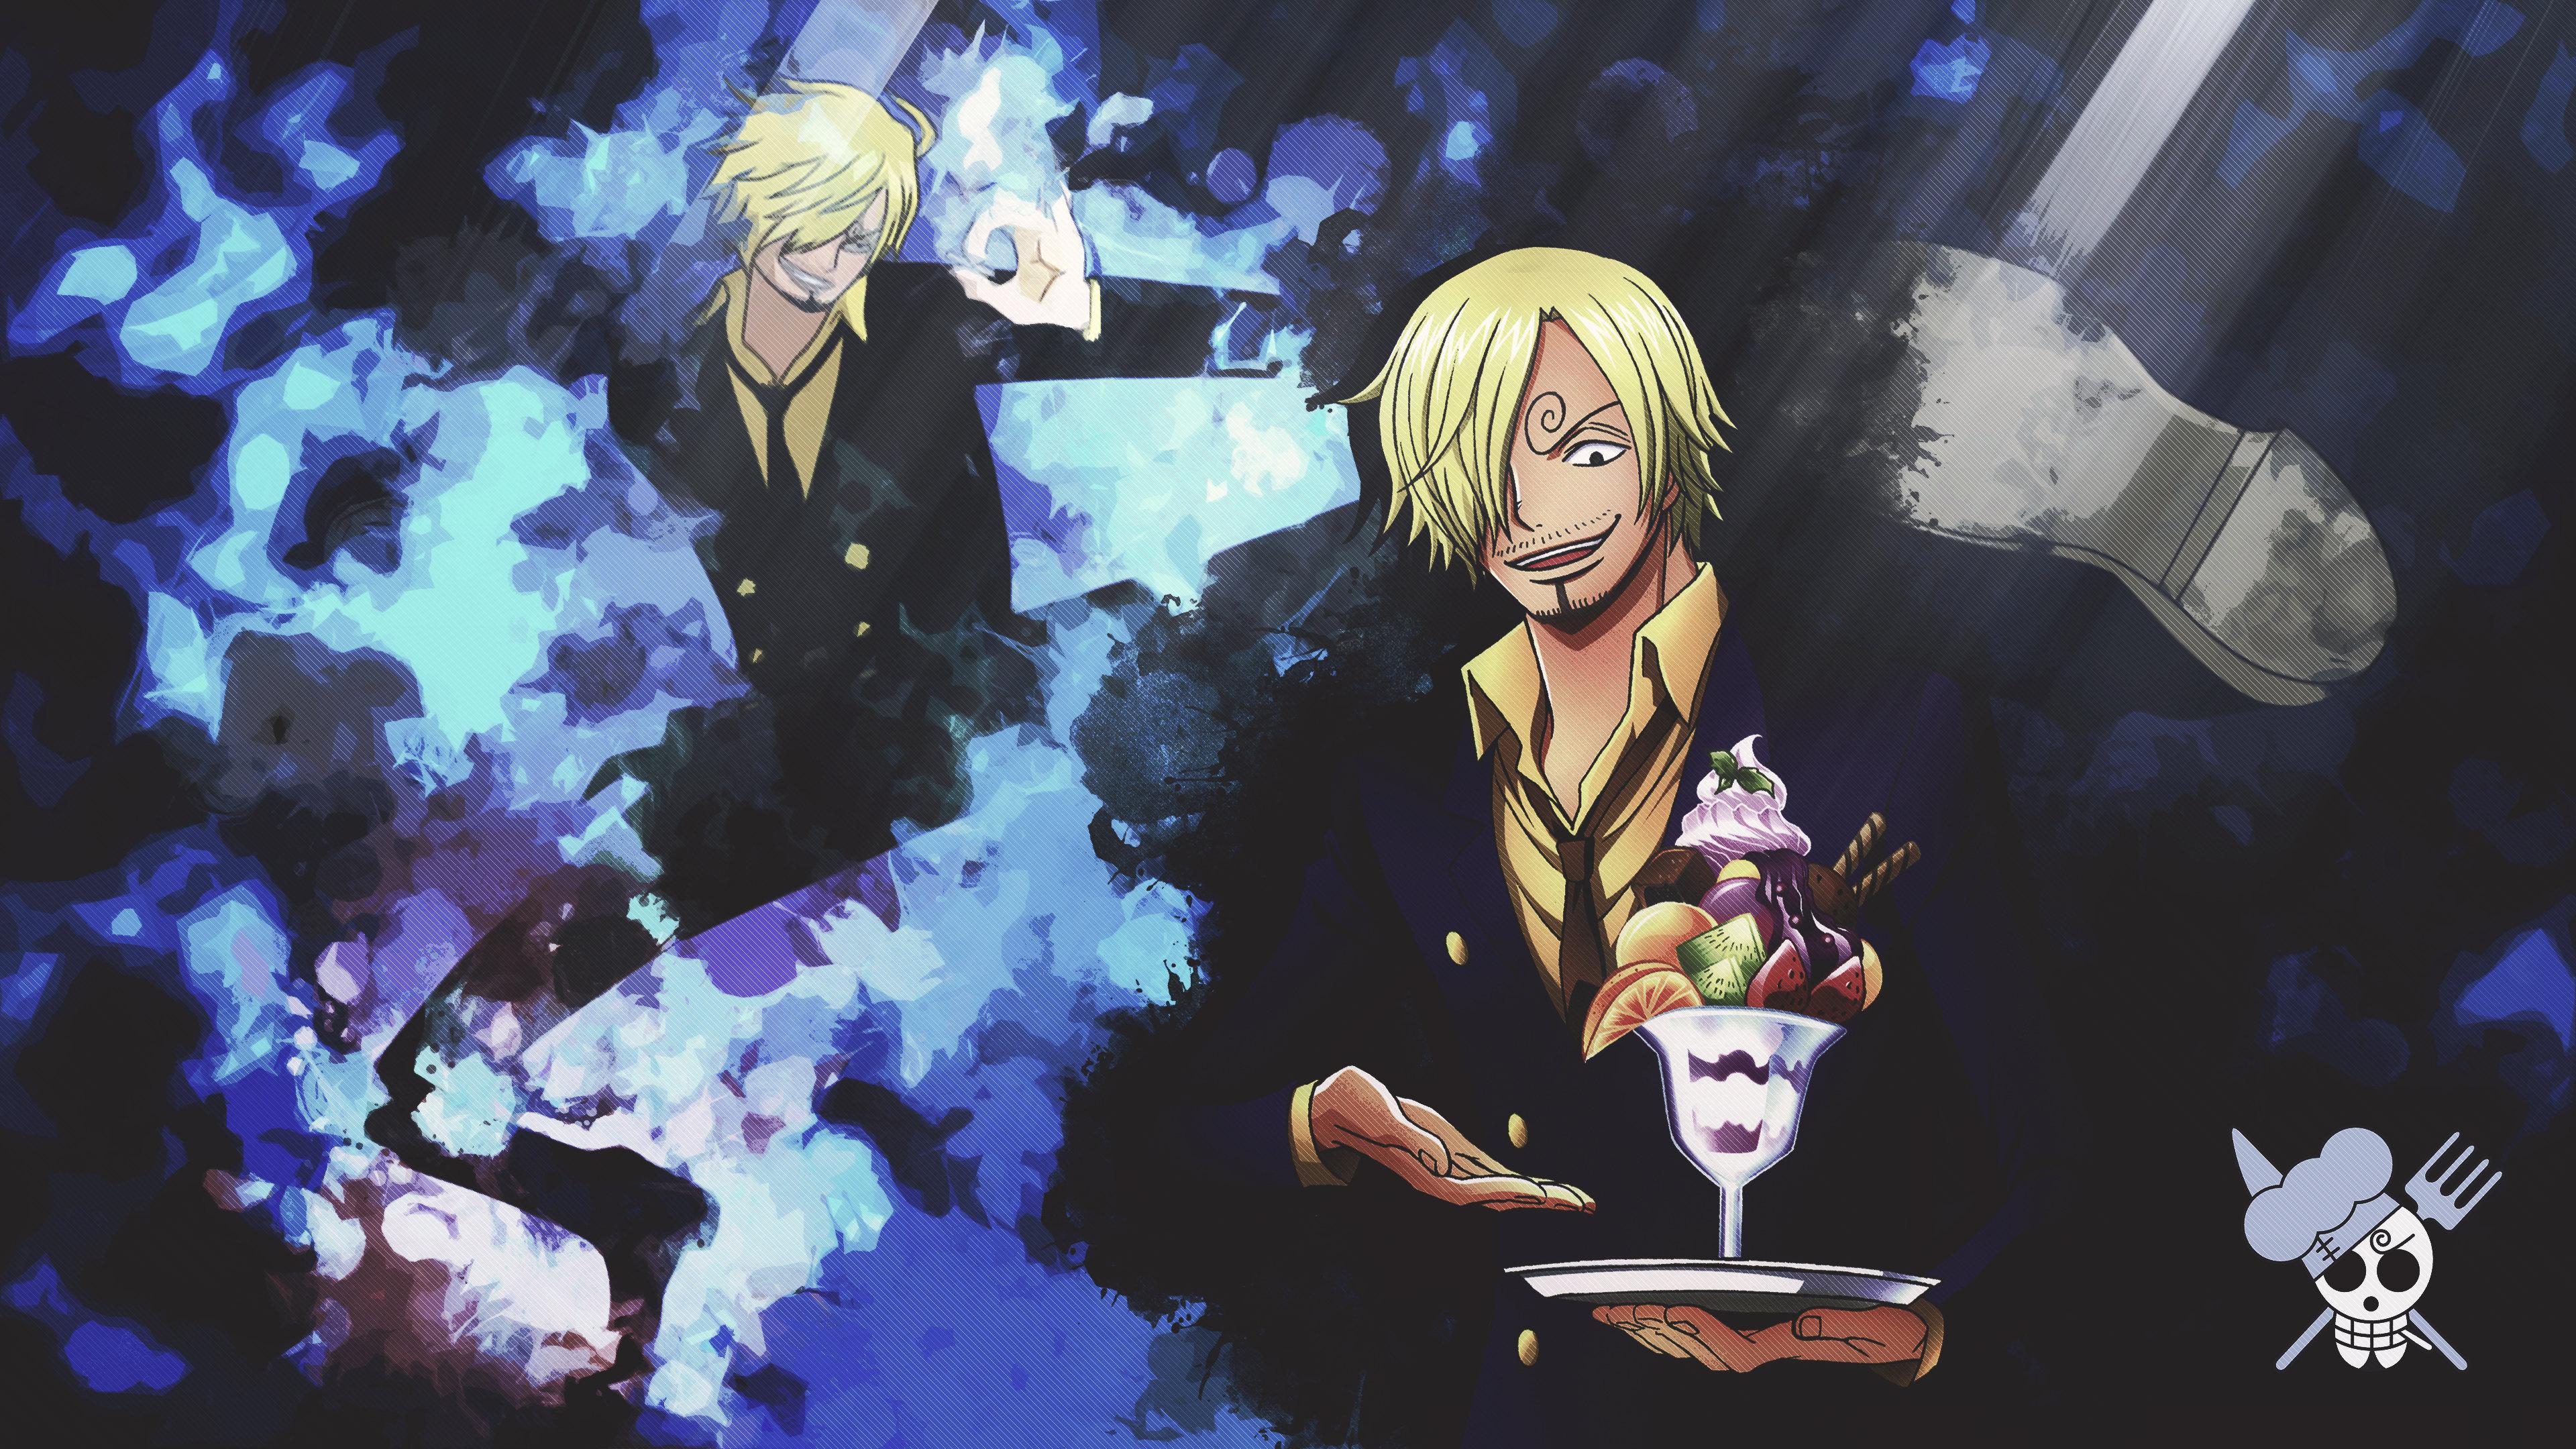 High Resolution Sanji Hd 4k Background Id - 4k Anime One Piece - HD Wallpaper